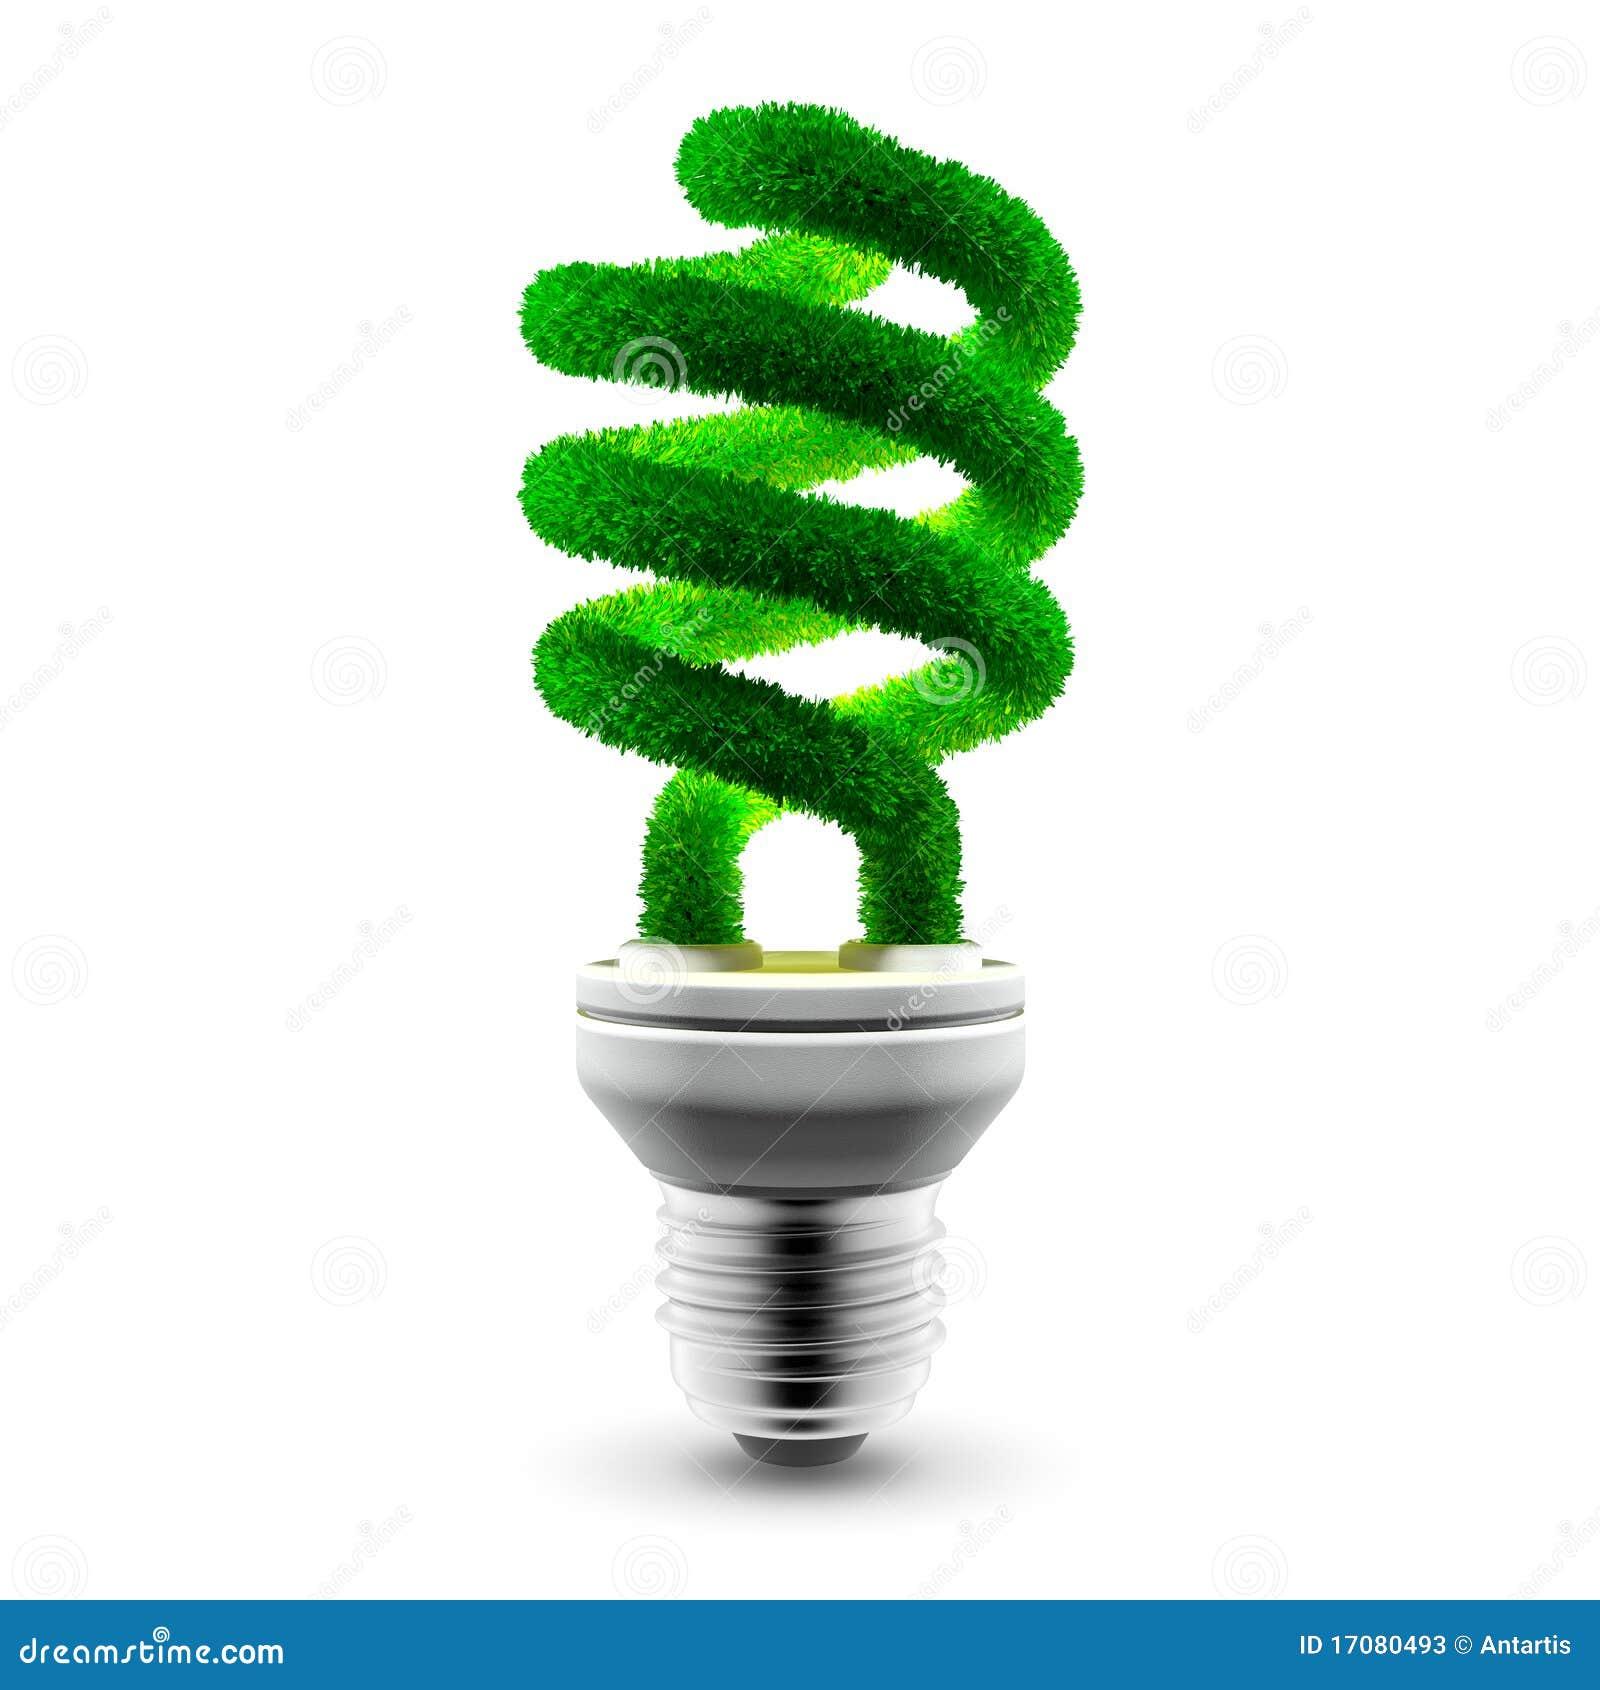 Grüne energiesparende Lampe